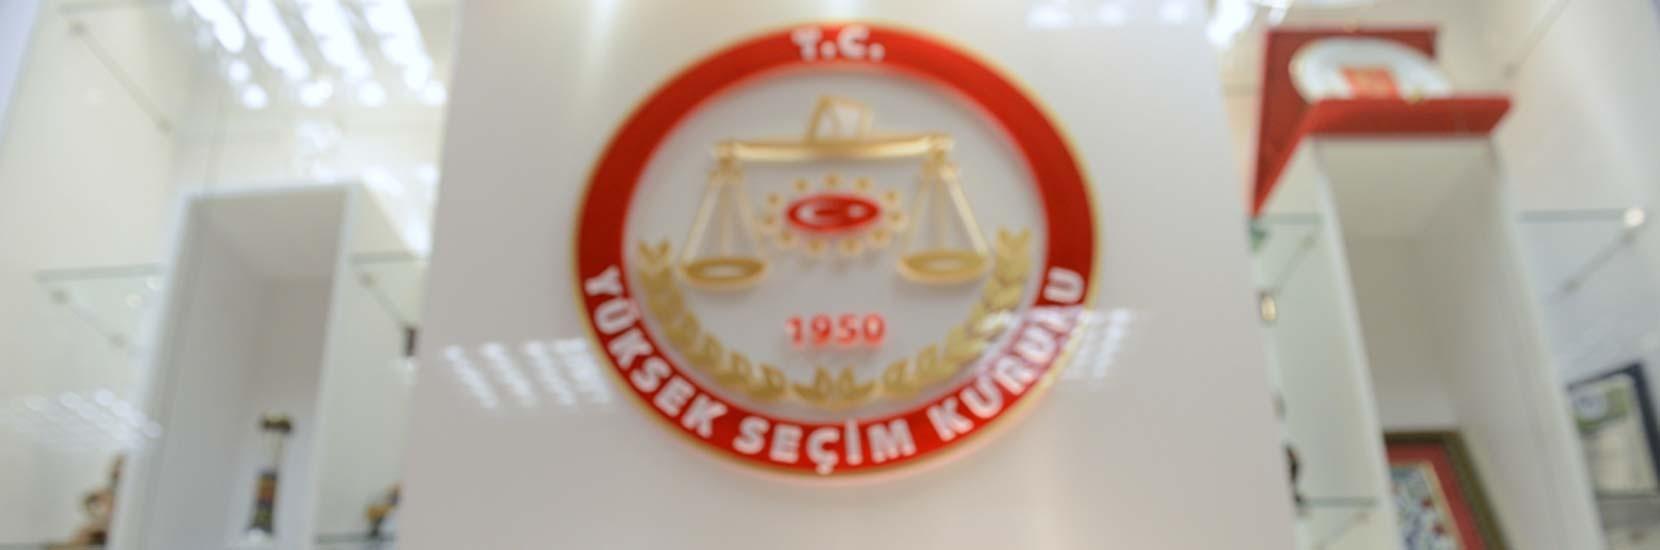 Seçim Günlüğü (31 Mayıs 2018) - AYM'den CHP'ye ret